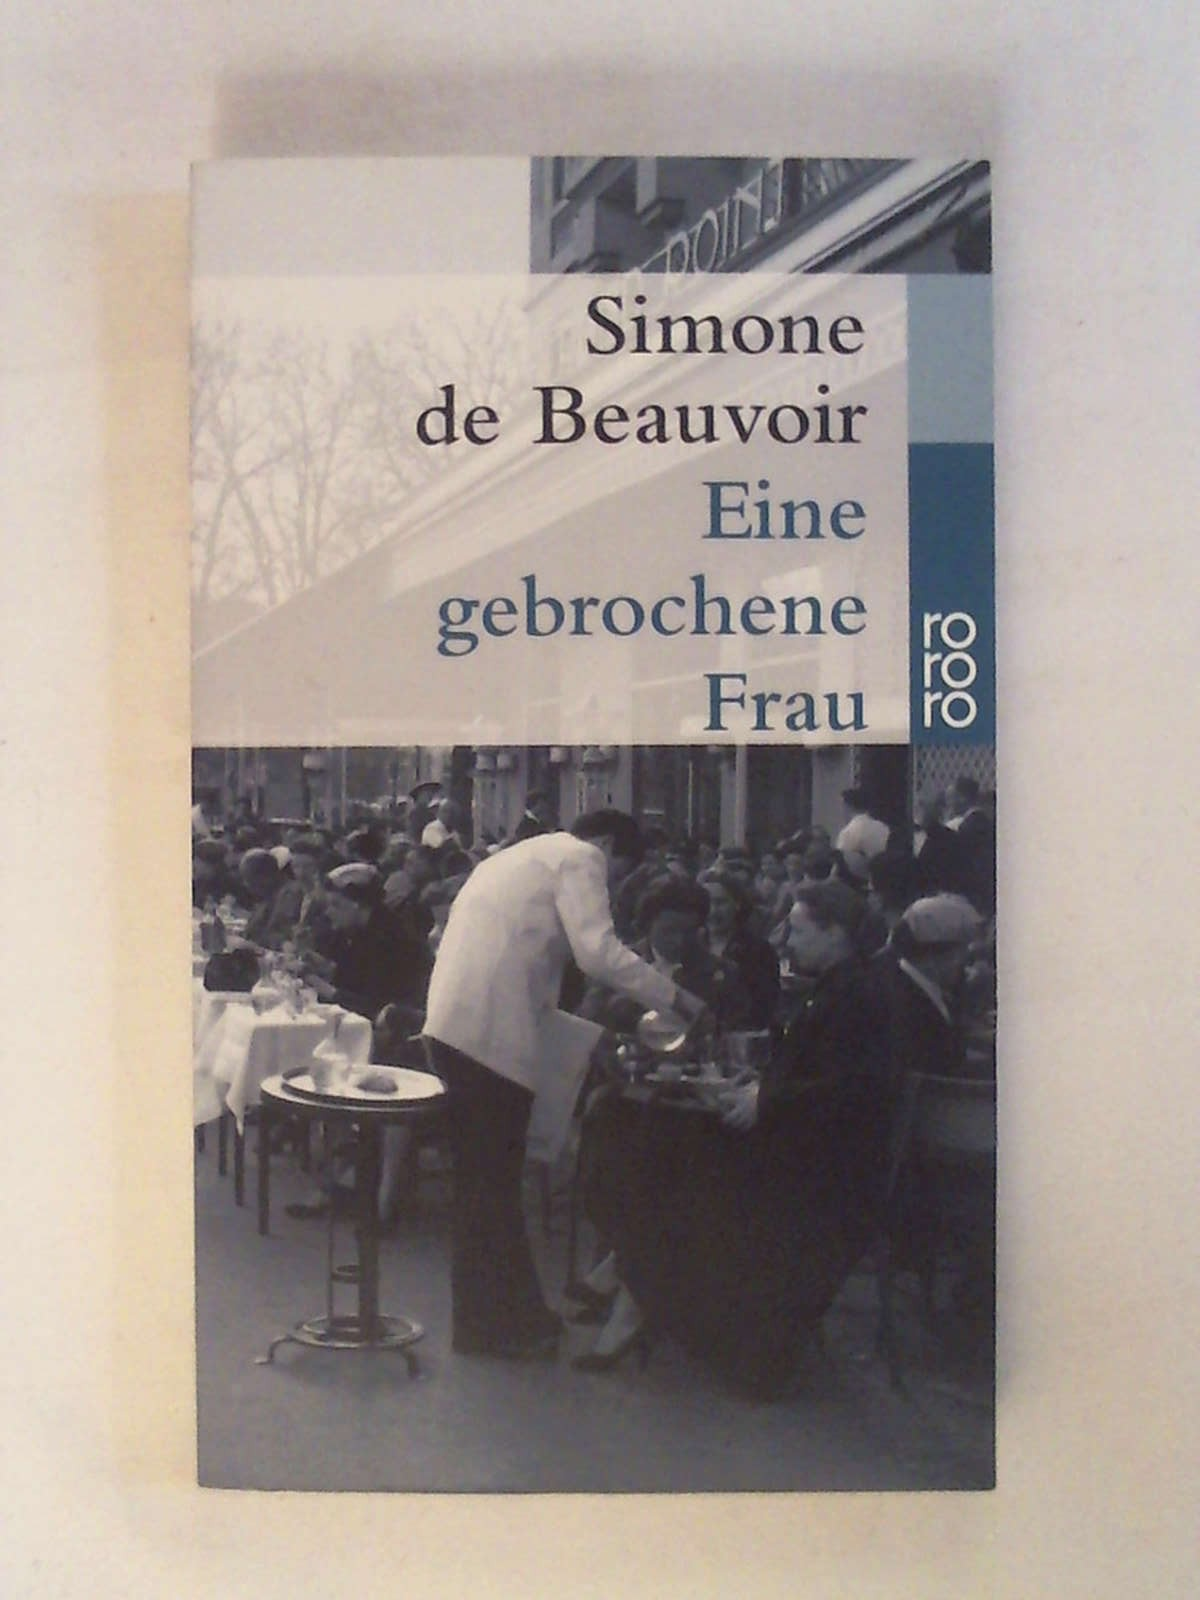 Eine gebrochene Frau - Simone de Beauvoir